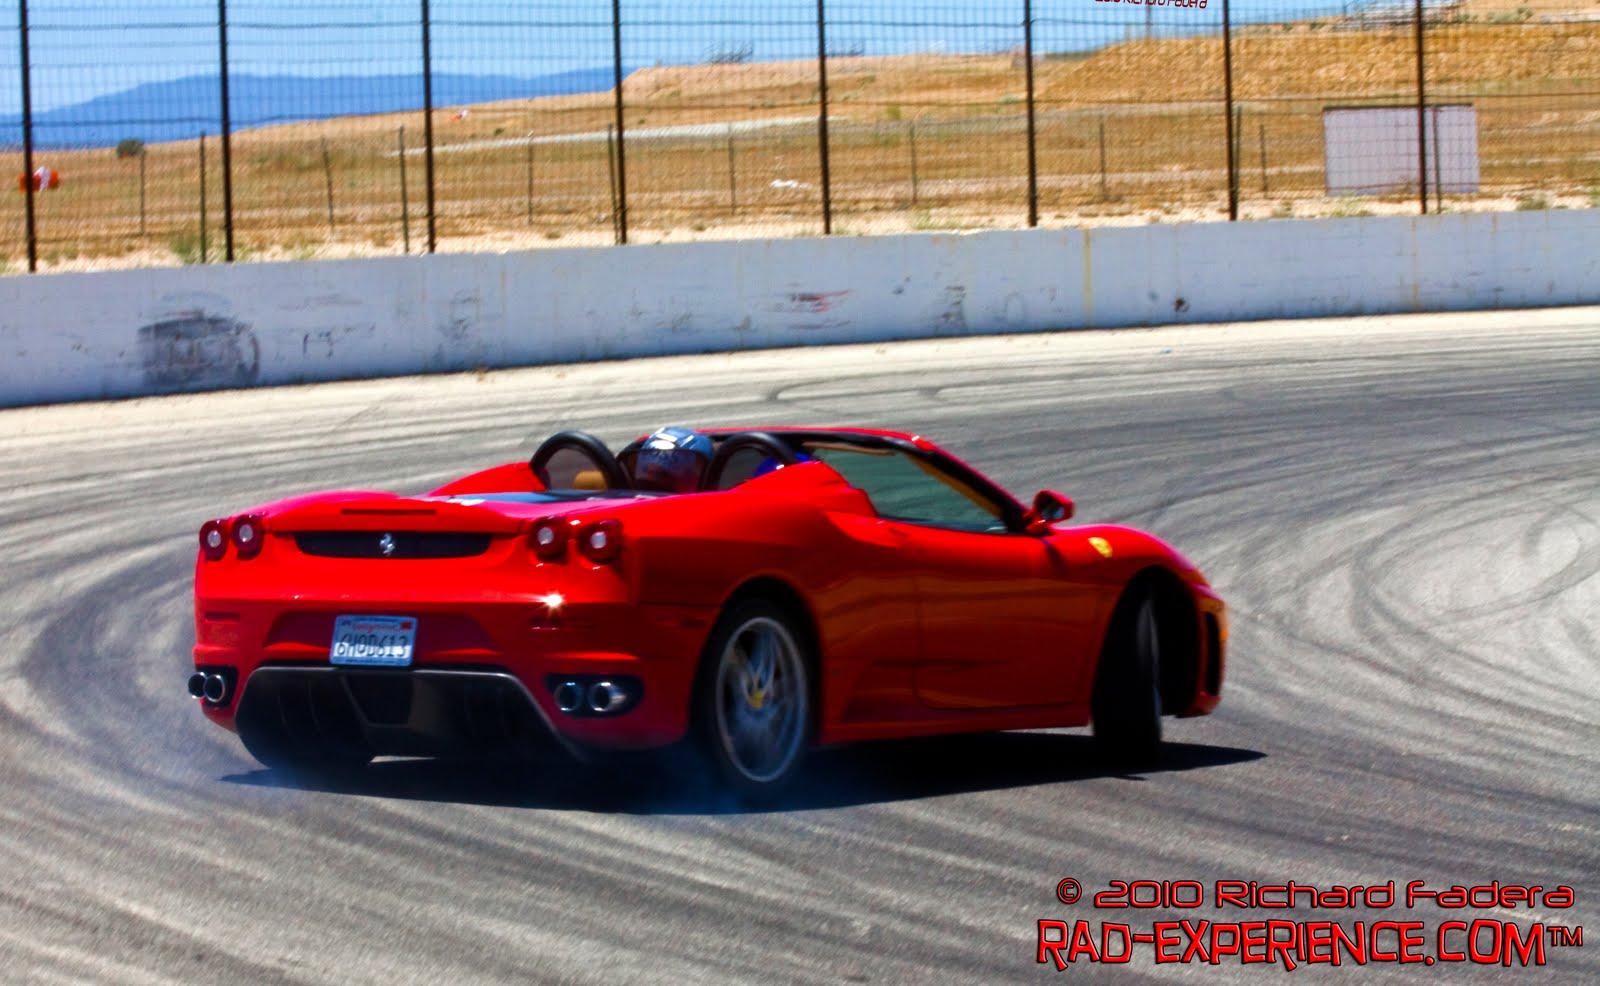 Like Drift Cars The Ferrari